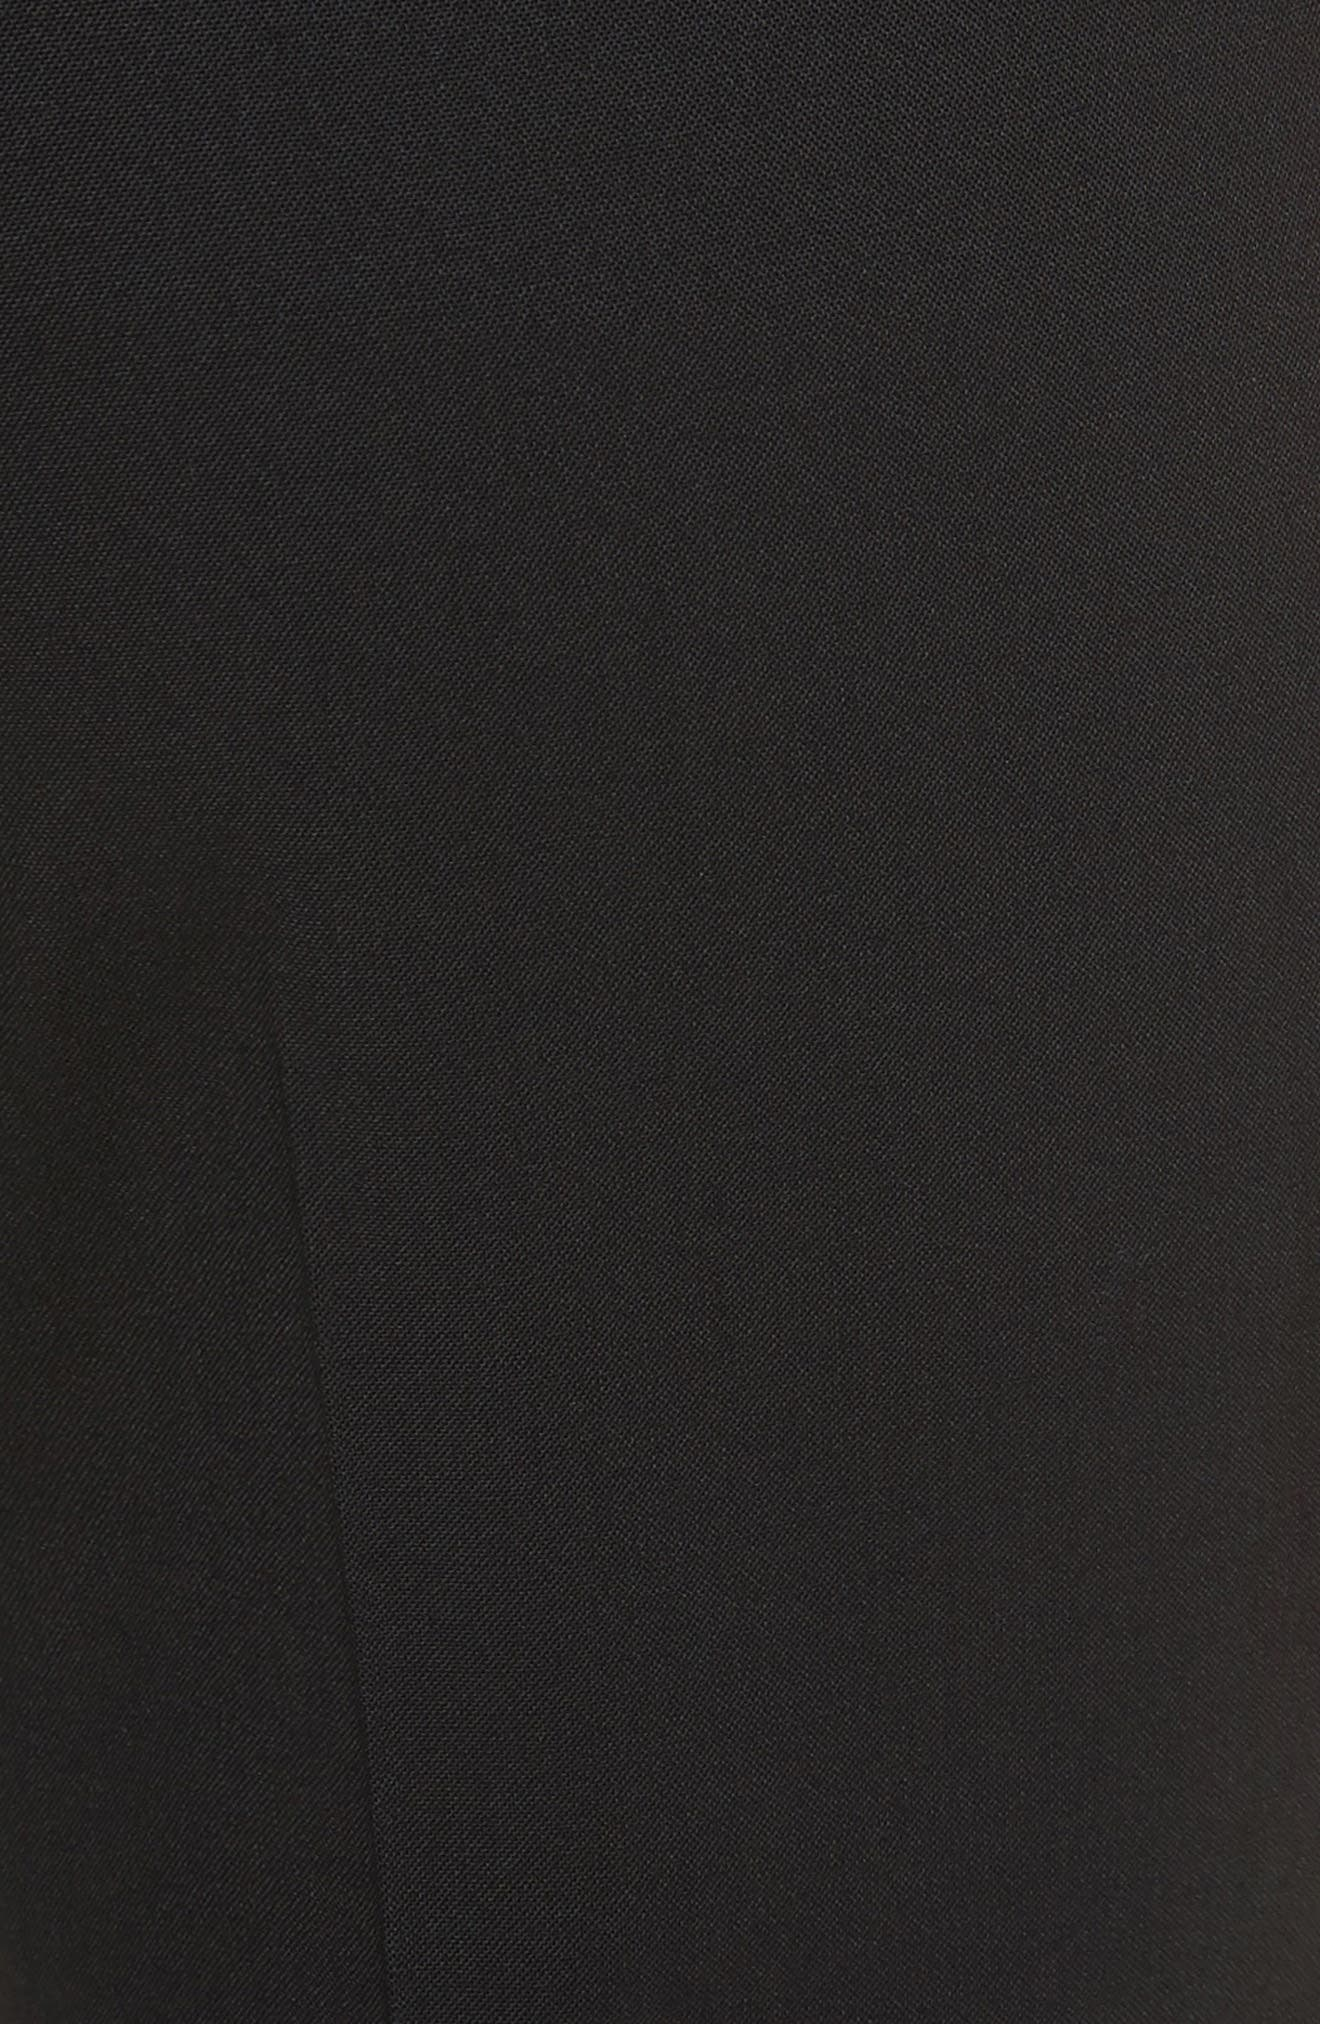 THEORY, Demetria 2 Flare Leg Good Wool Suit Pants, Alternate thumbnail 6, color, BLACK